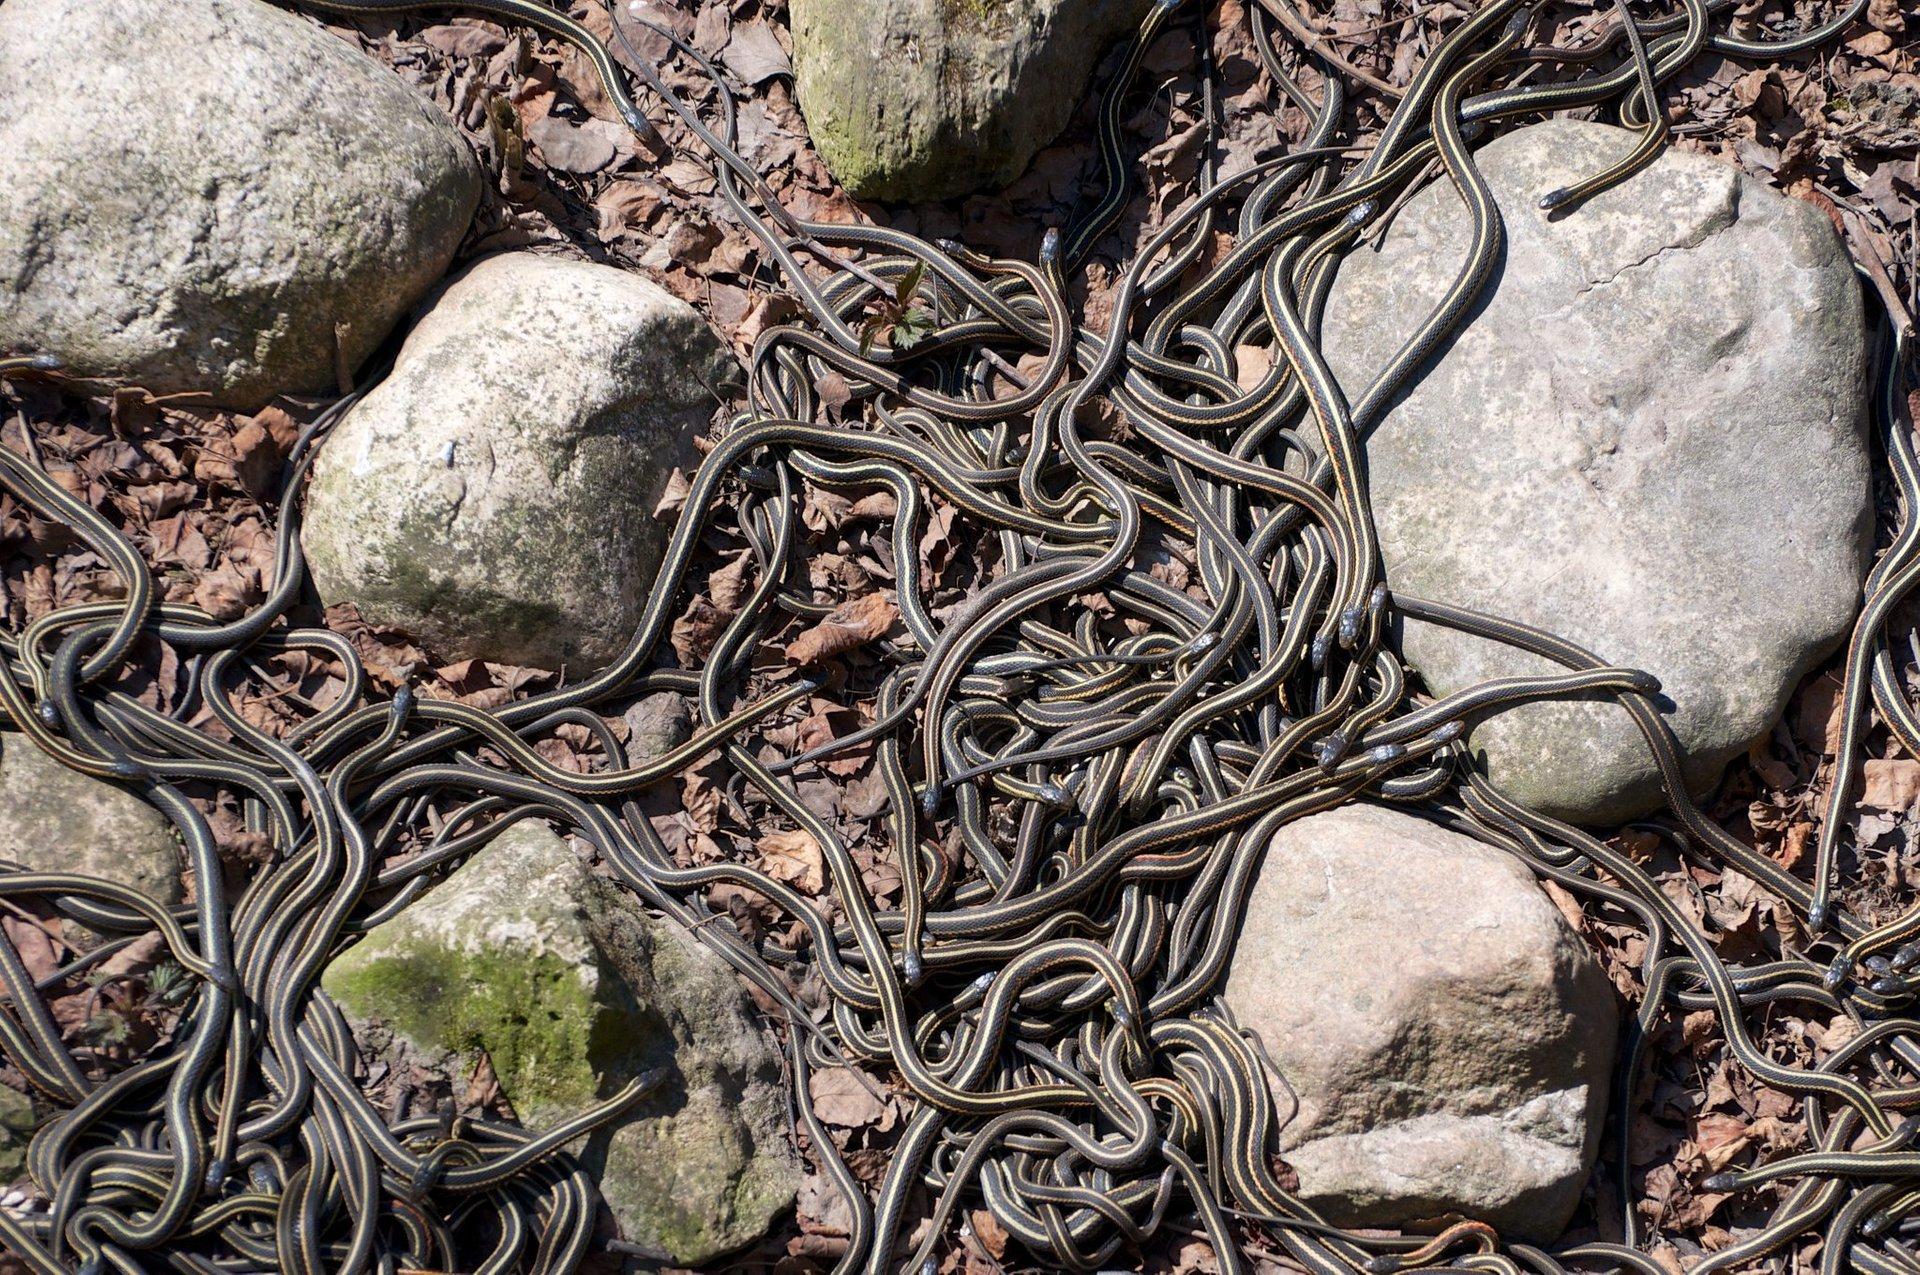 Narcisse Snake Dens in Manitoba - Best Season 2020